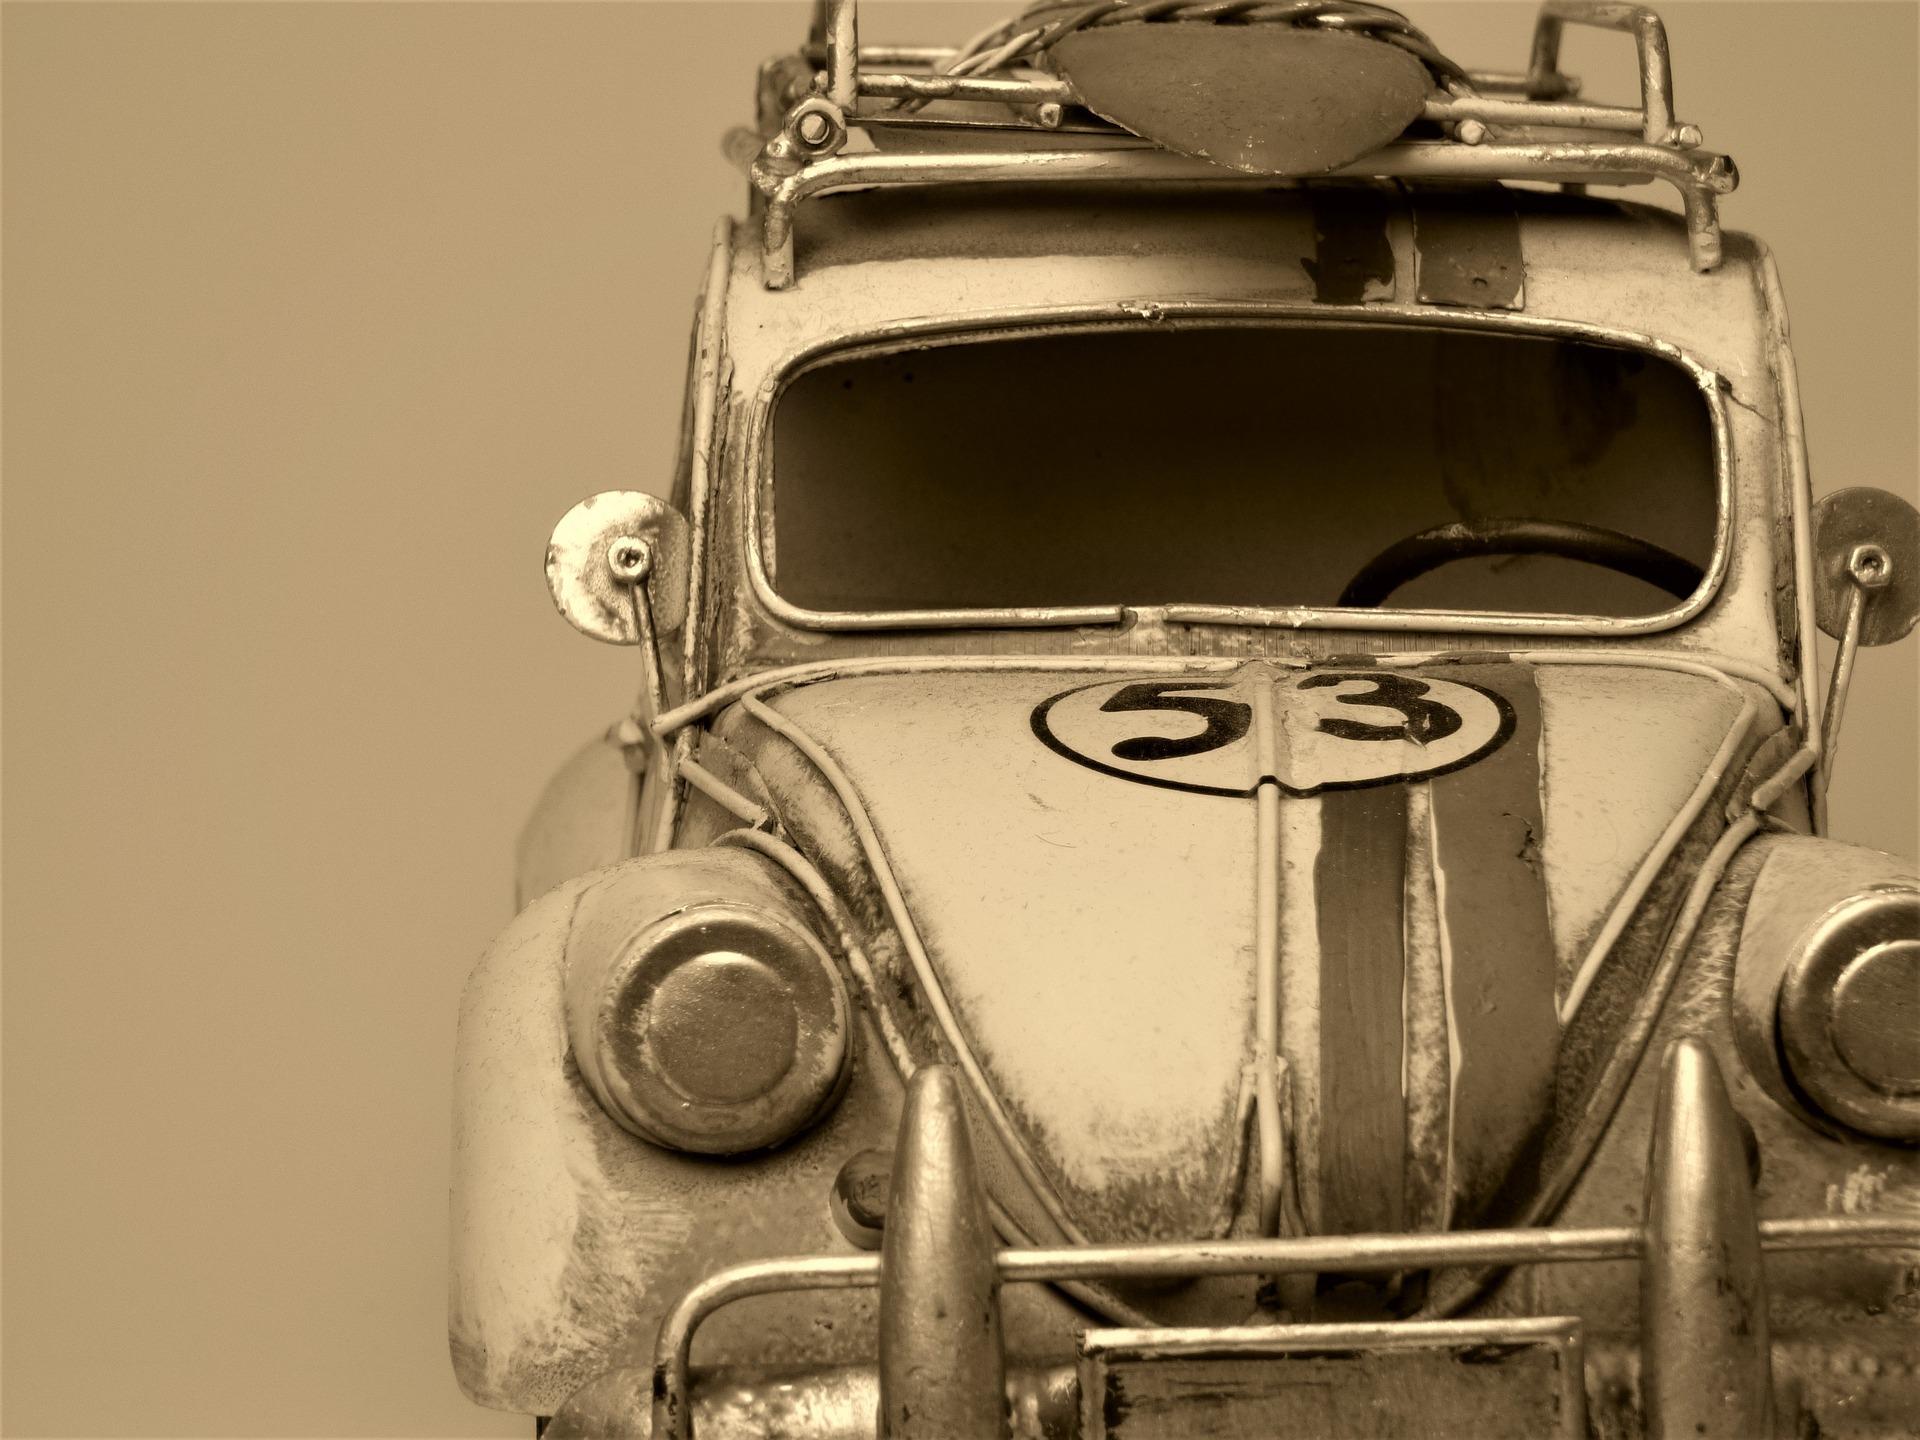 Driverless cars - still just a pipe dream.